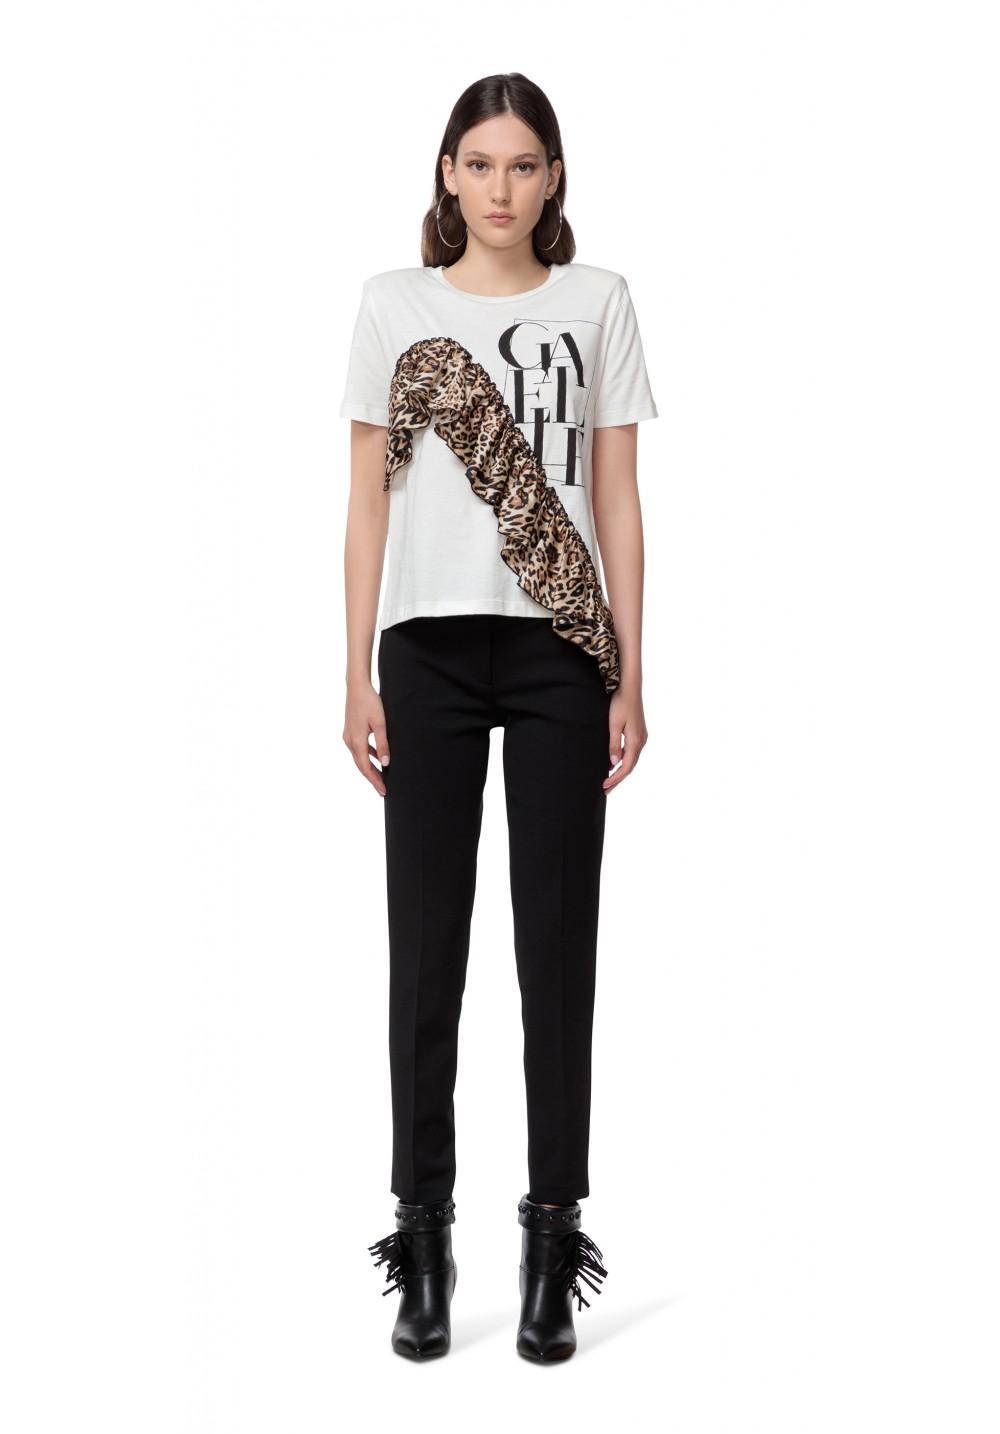 T-shirt donna bianca Gaelle | GBD10098BIANCO